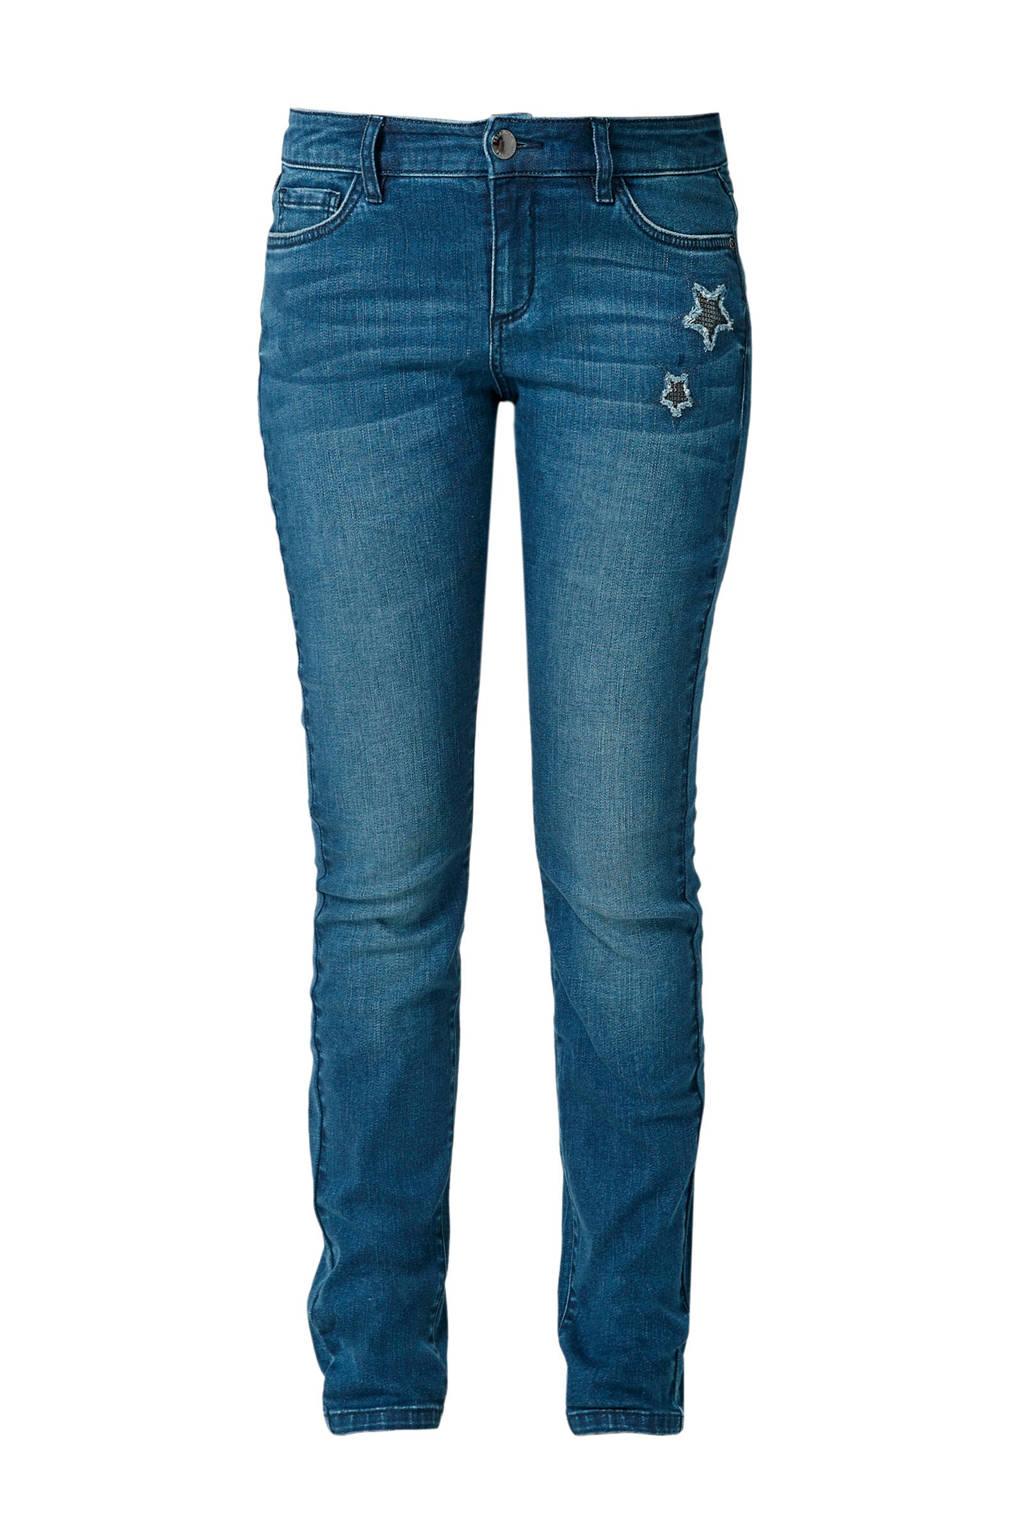 TRIANGLE curvy fit jeans, Blauw